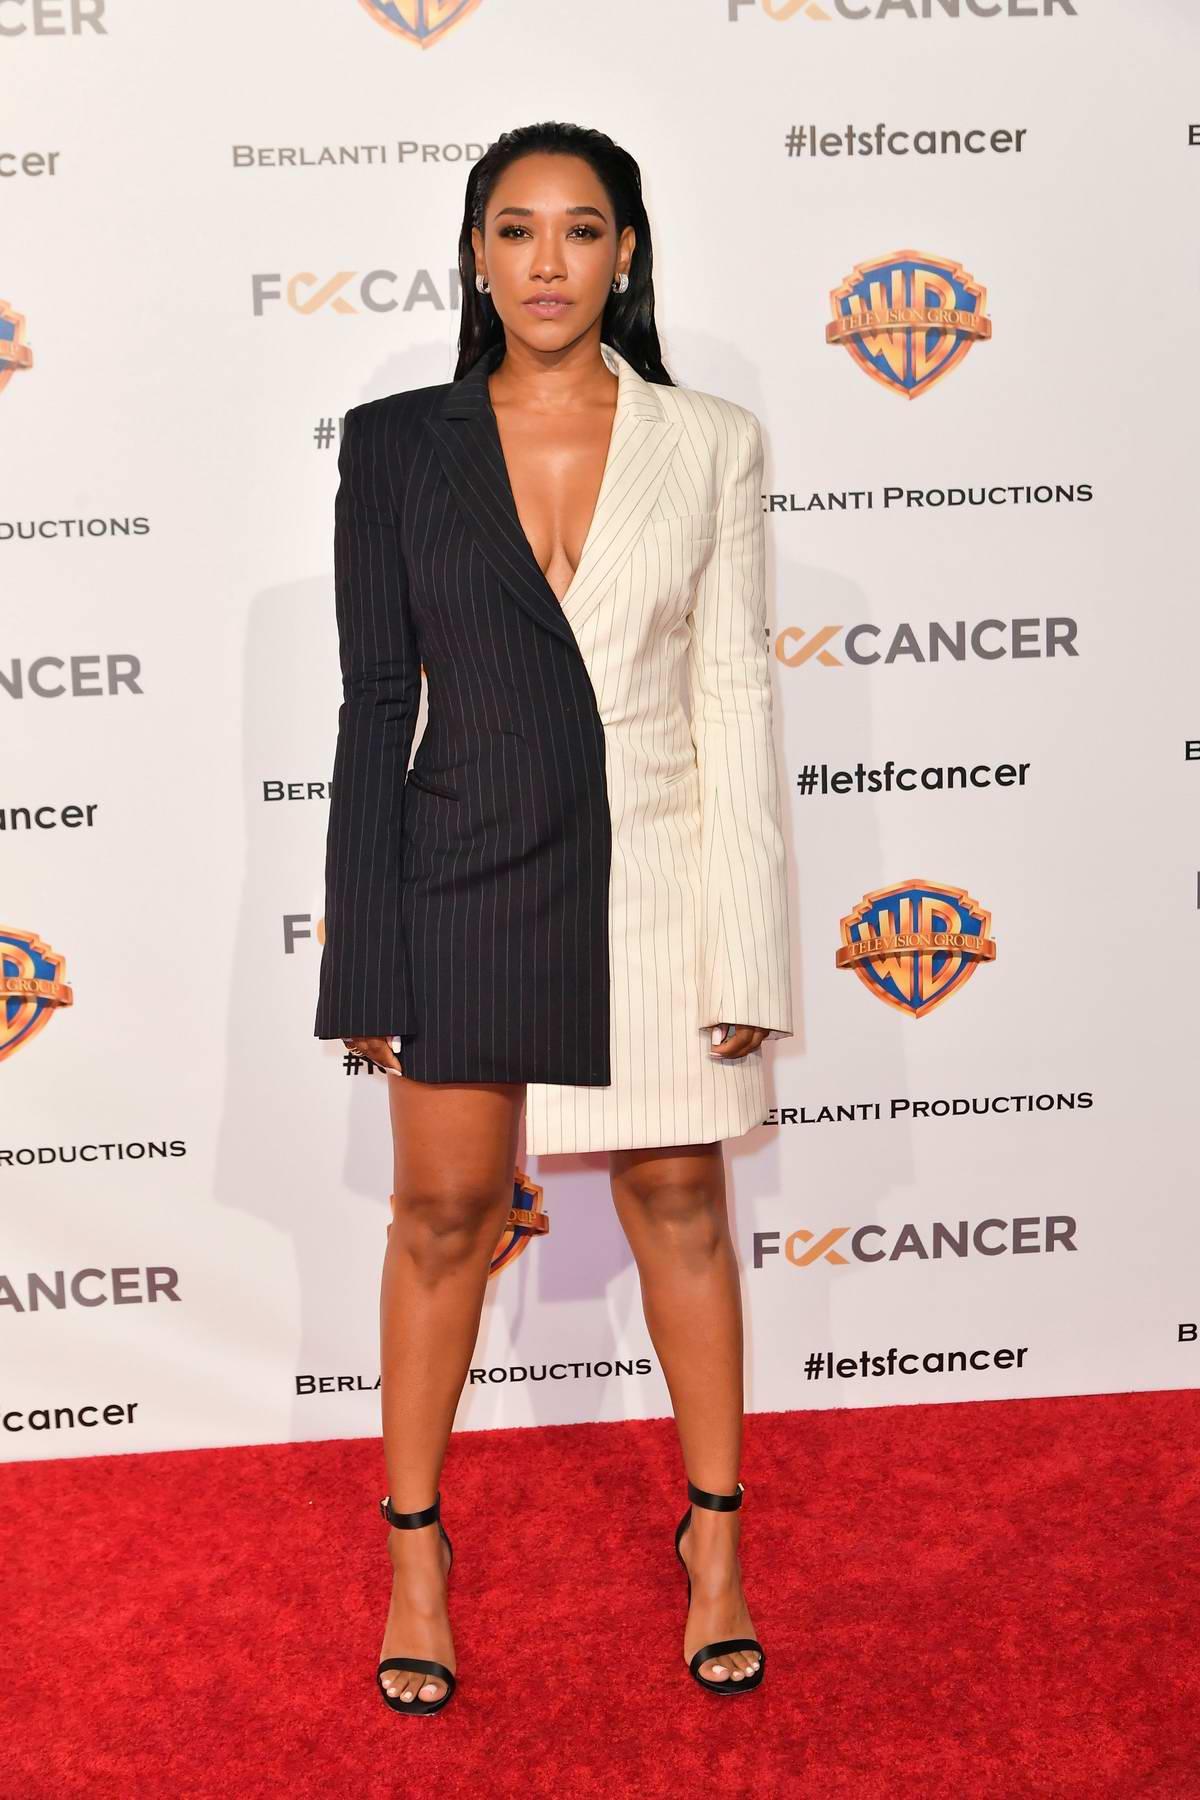 Candice Patton attends Fck Cancer's 1st Annual Barbara Berlanti Heroes Gala in Burbank, California